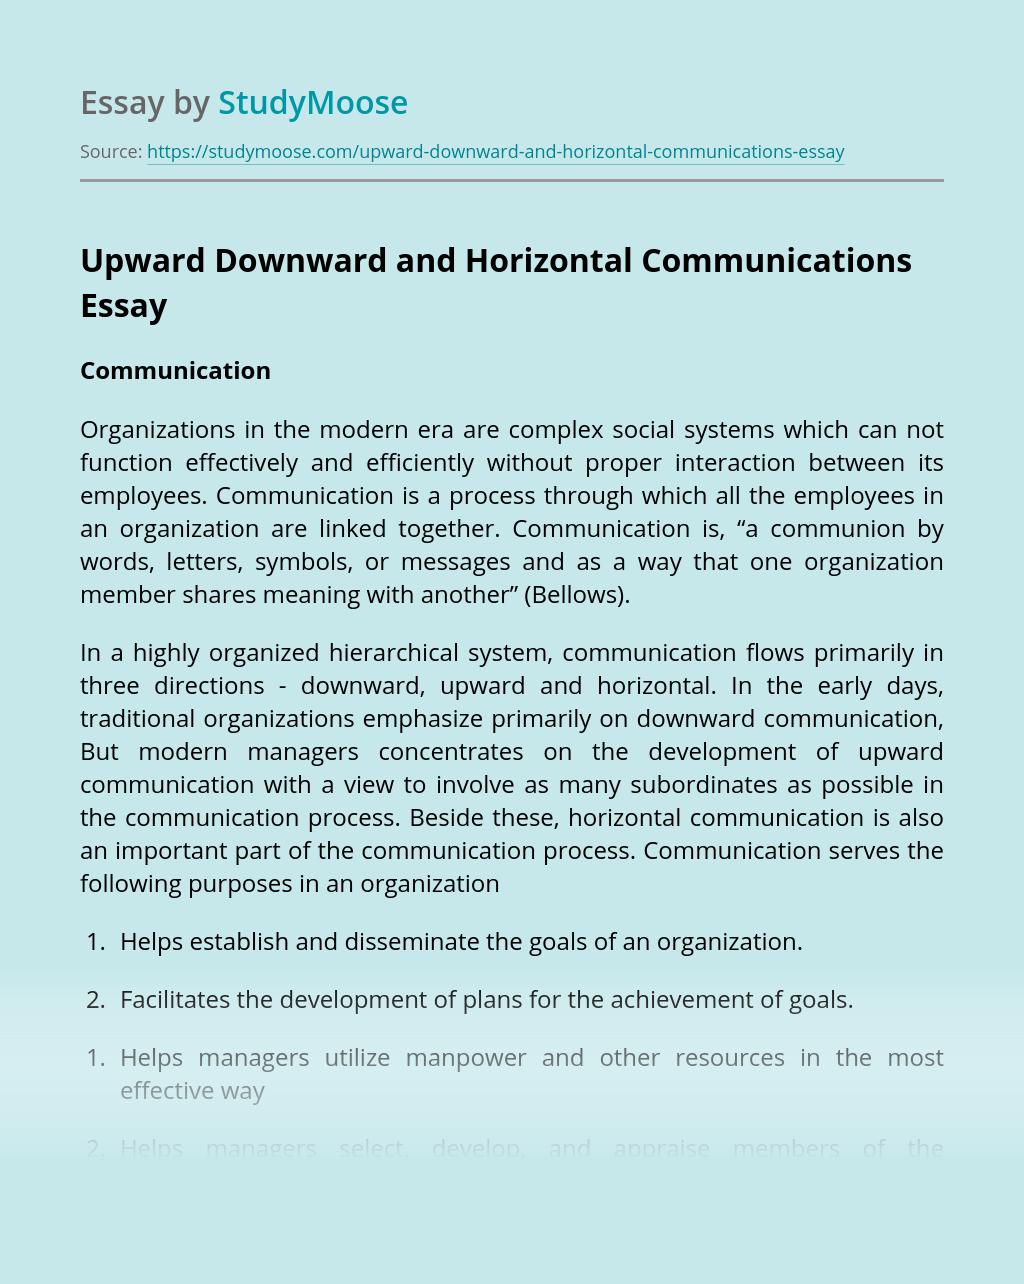 Upward Downward and Horizontal Communications